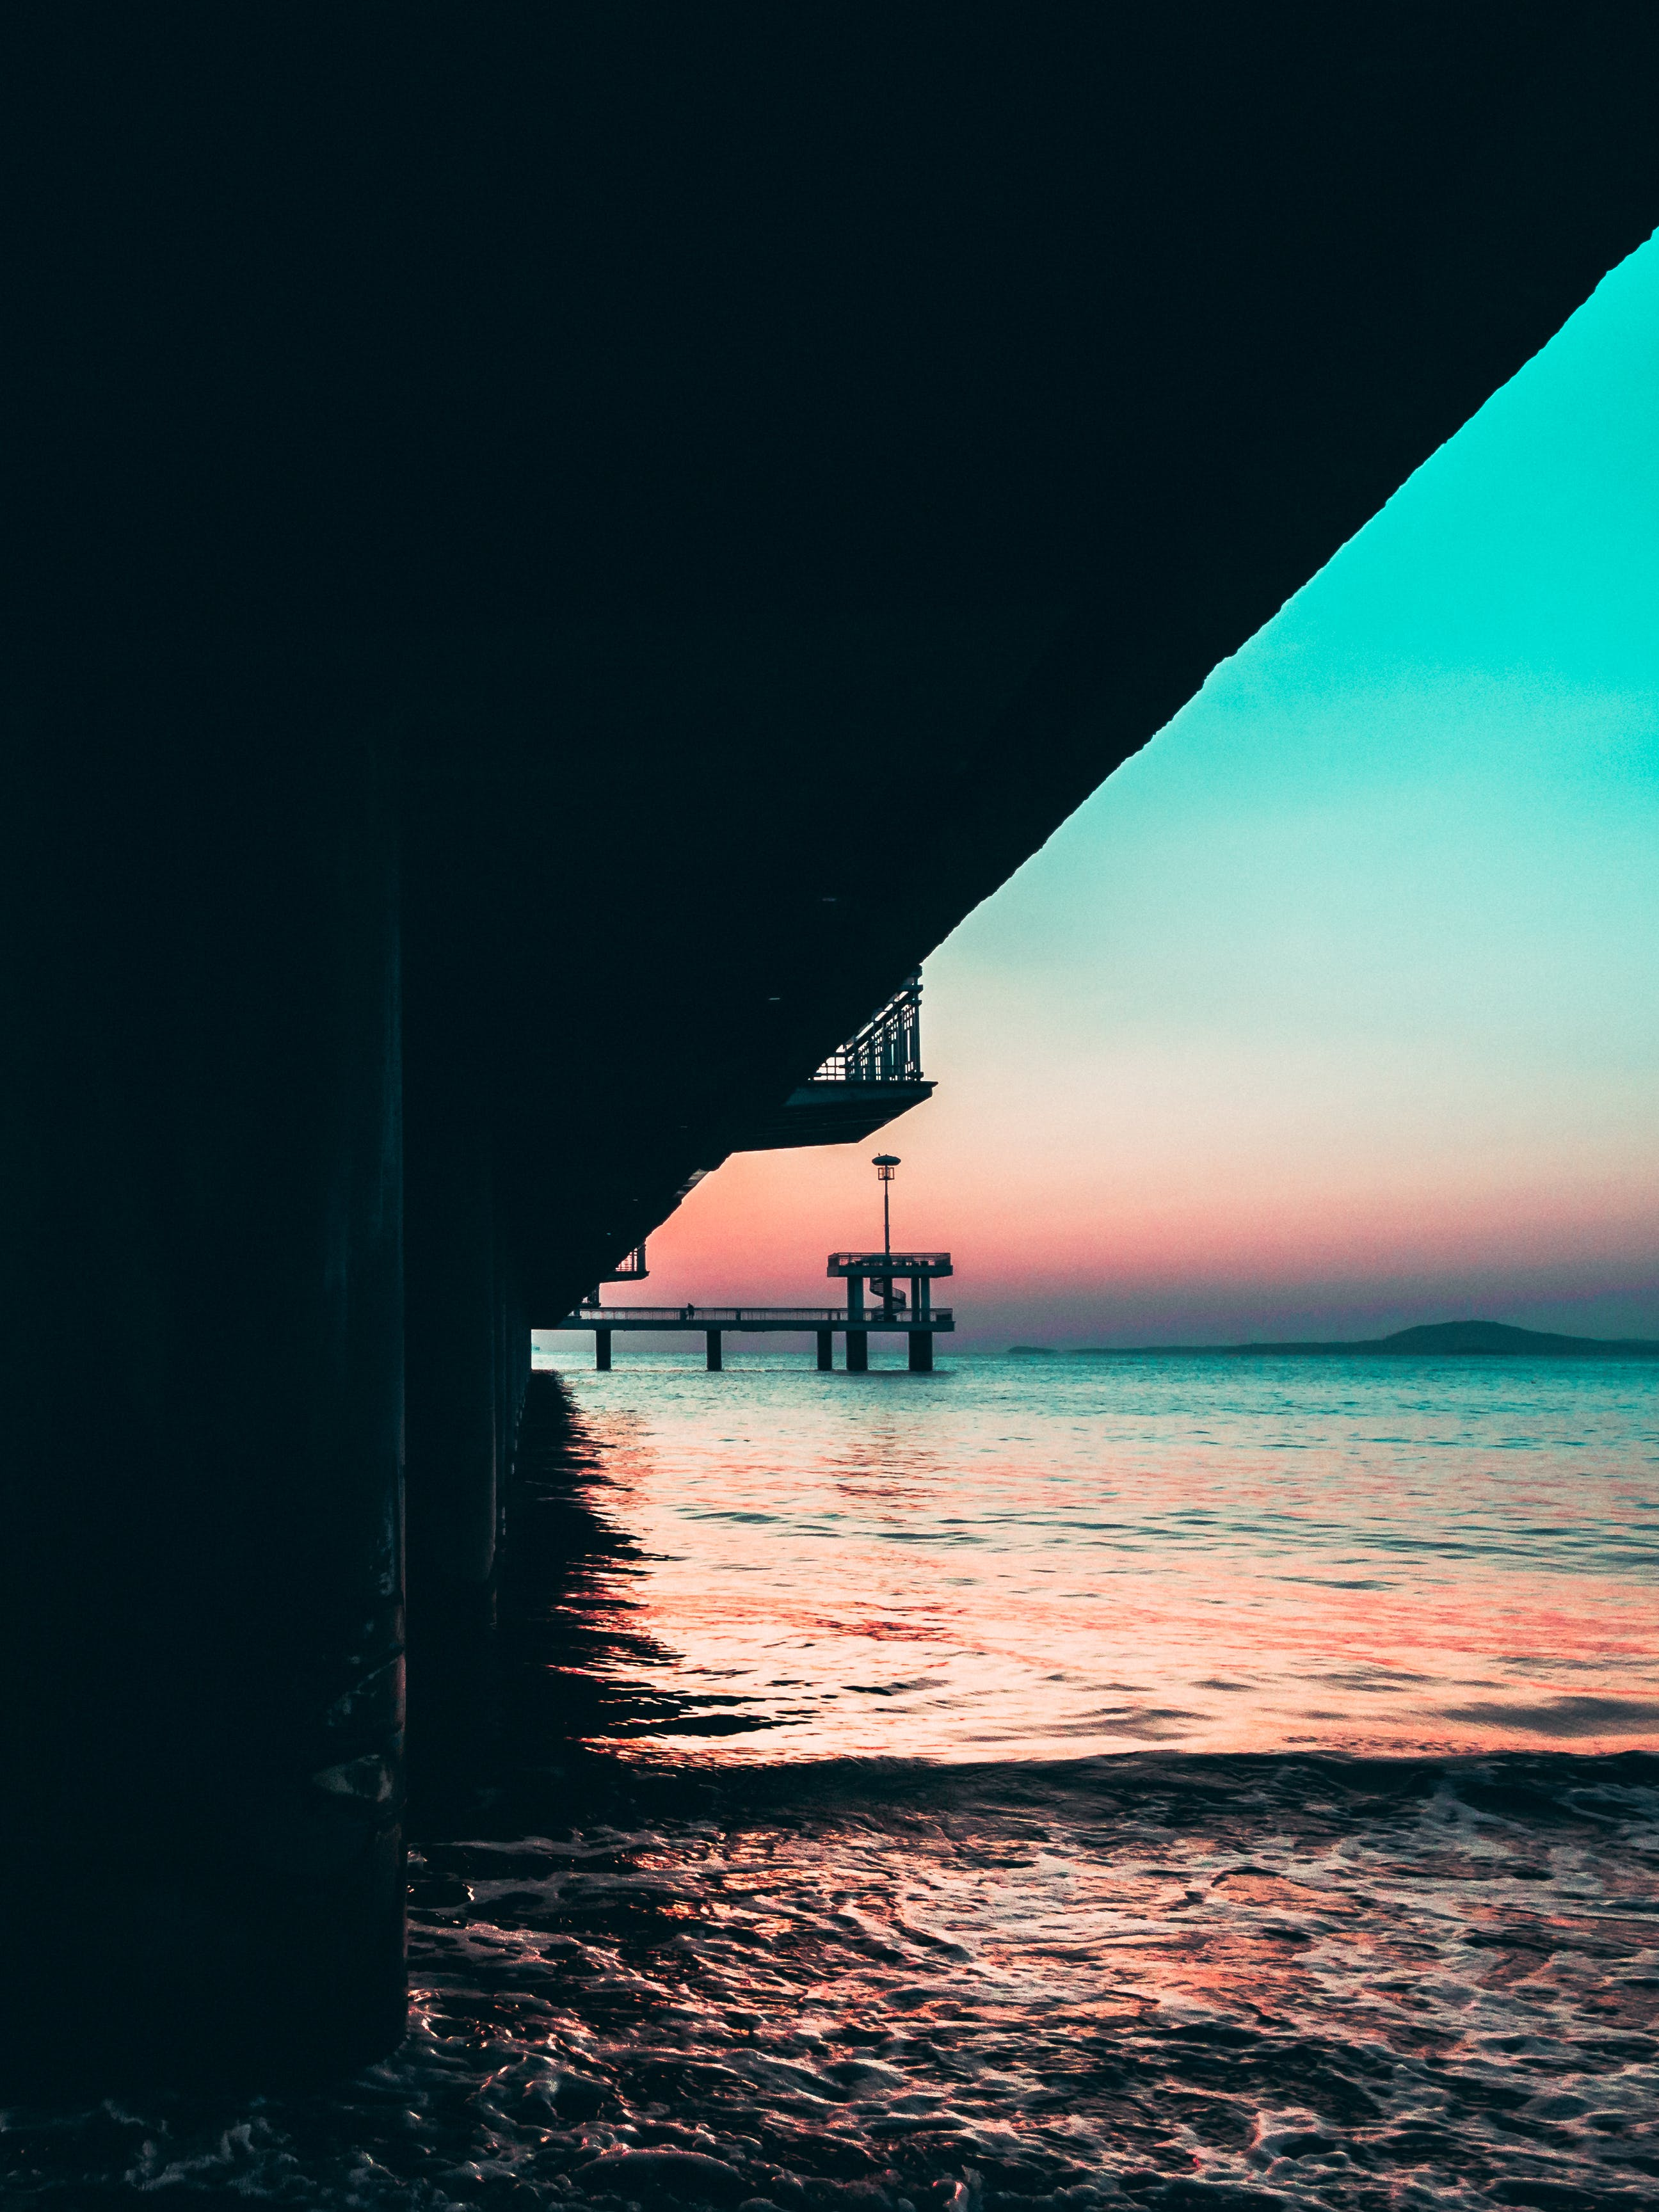 Landscape Photo of Dock